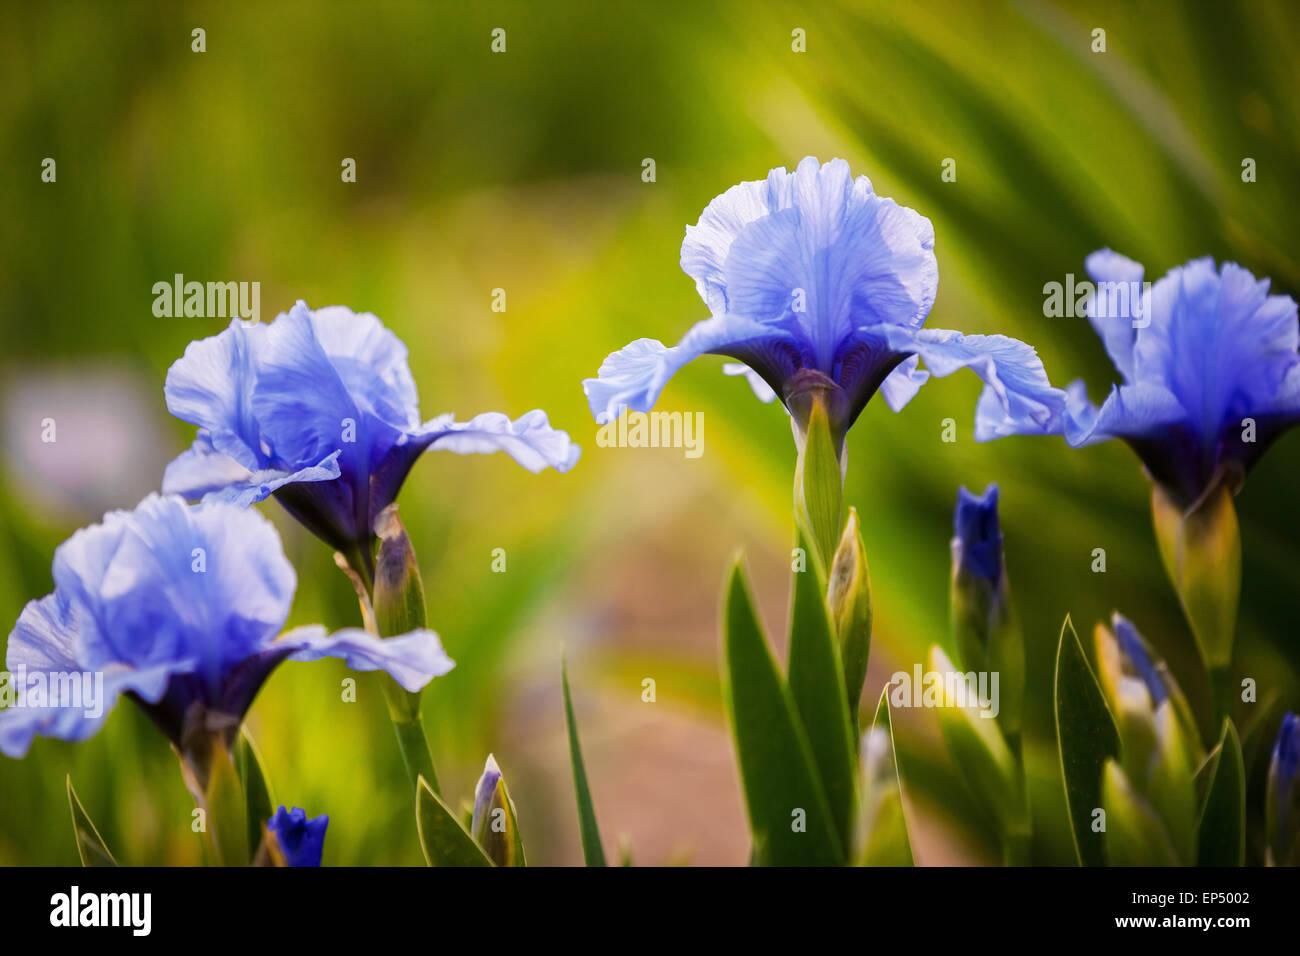 Blue Iris Flowers Growing In Stock Photos Blue Iris Flowers